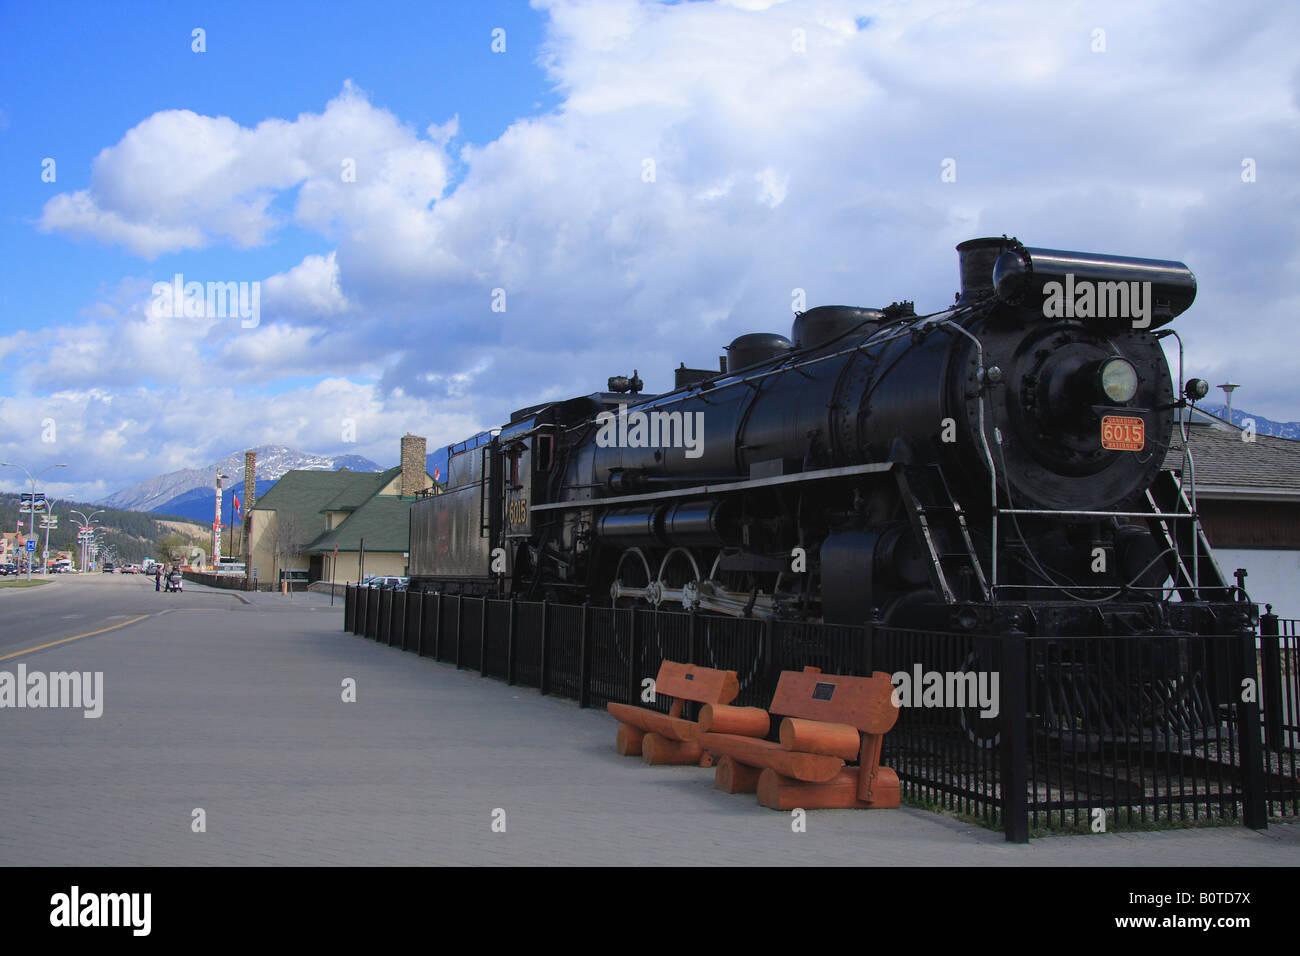 Old locomotive in Jasper village, Alberta Stock Photo